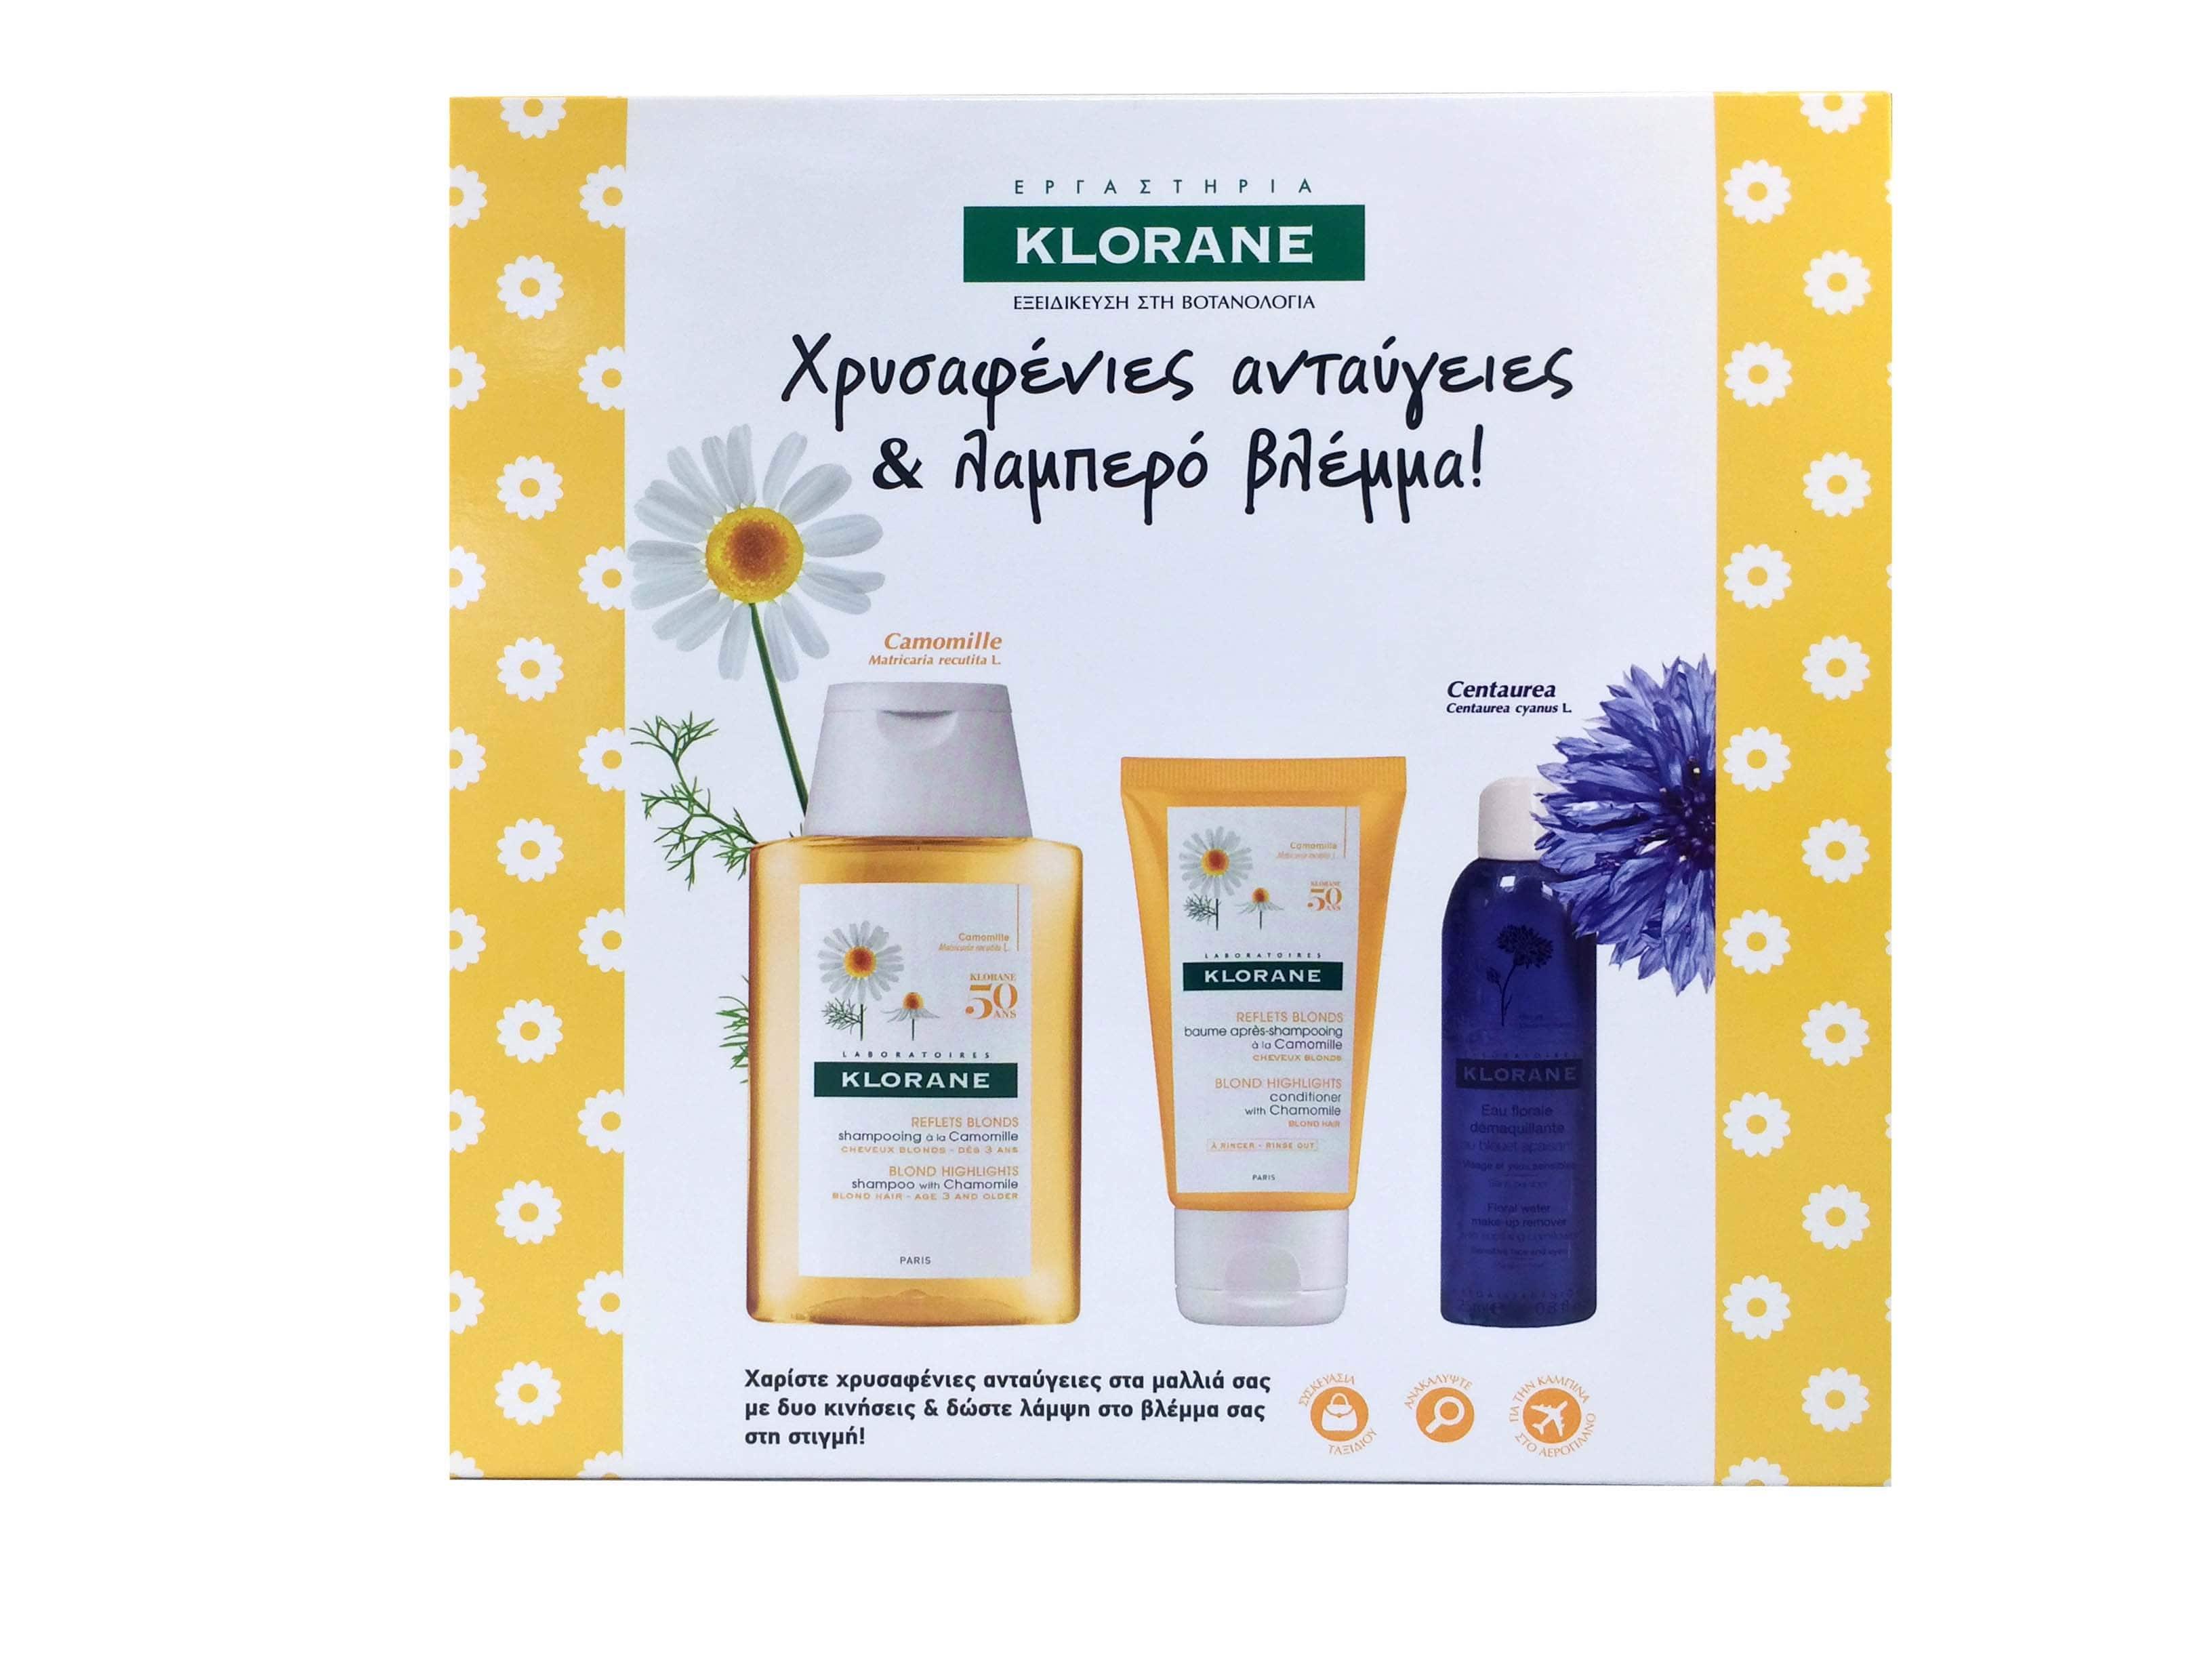 bc54adf383 Klorane TRAVEL SET Travel Kit Camomille Shampoo with Chamomile